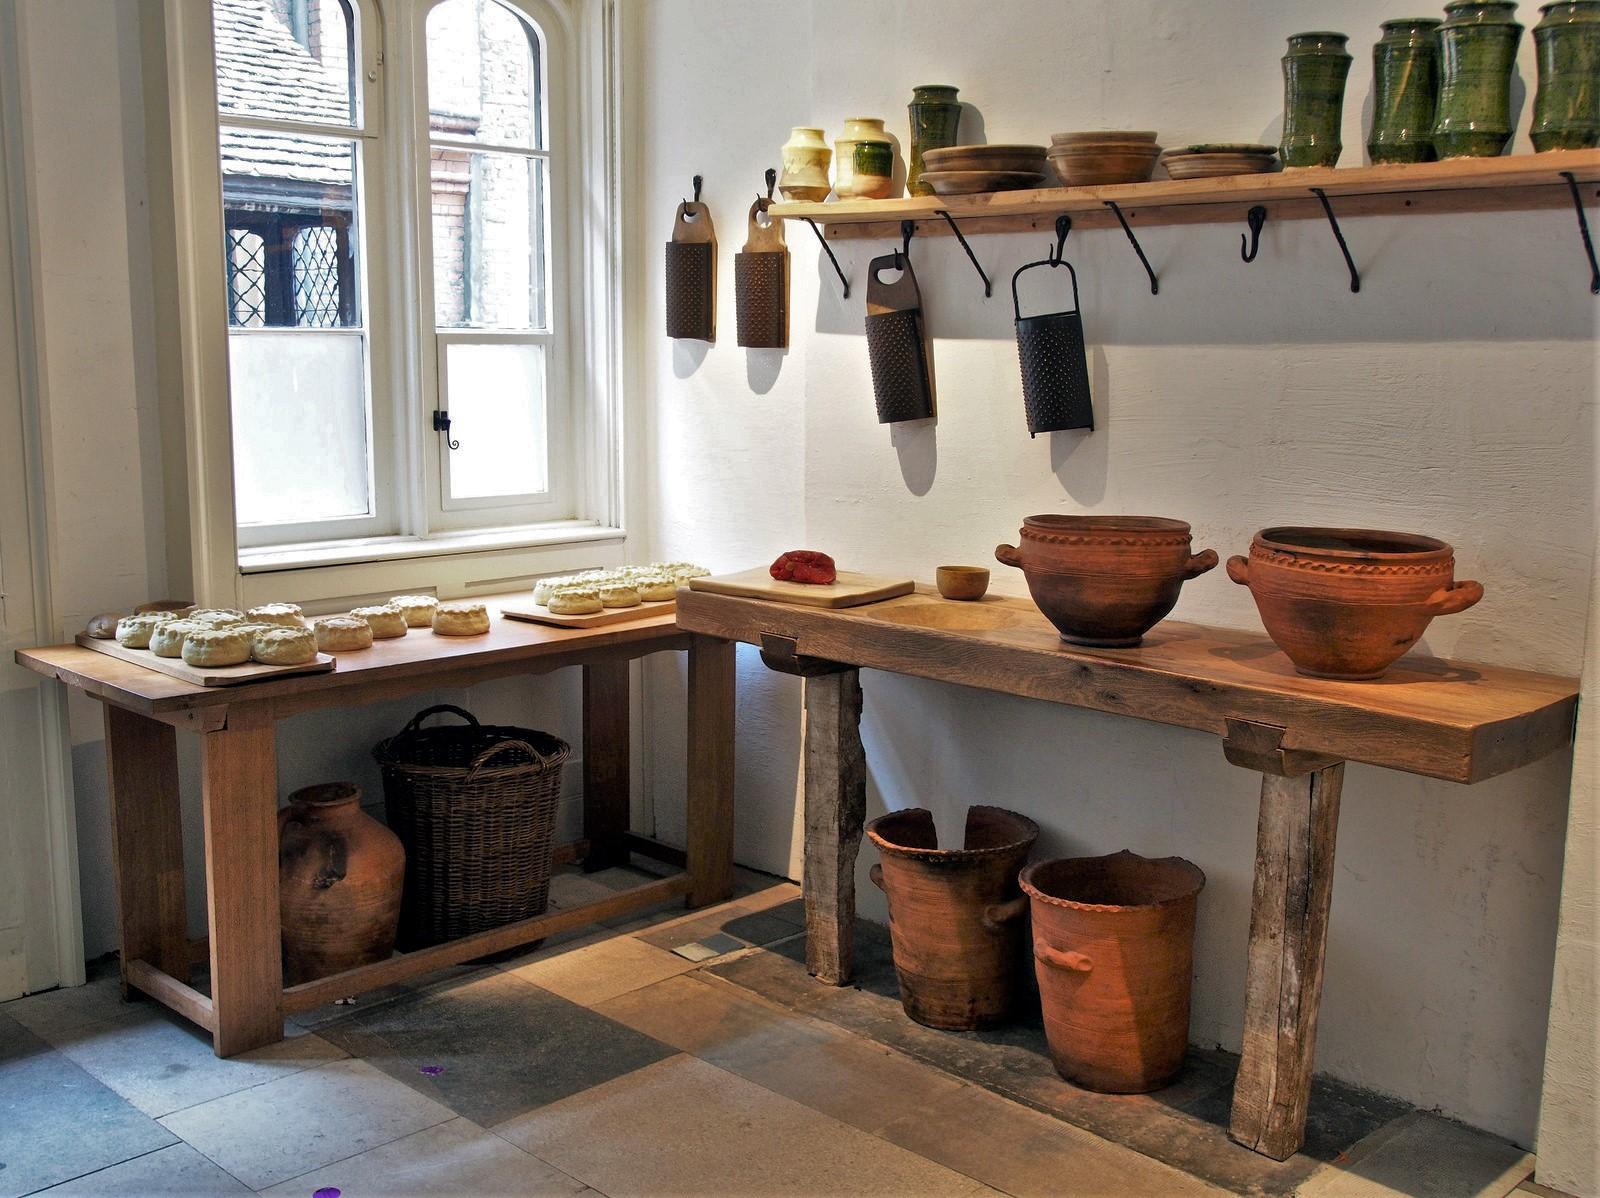 Hampton Court Kitchens. Credit David Farquhar, flickr